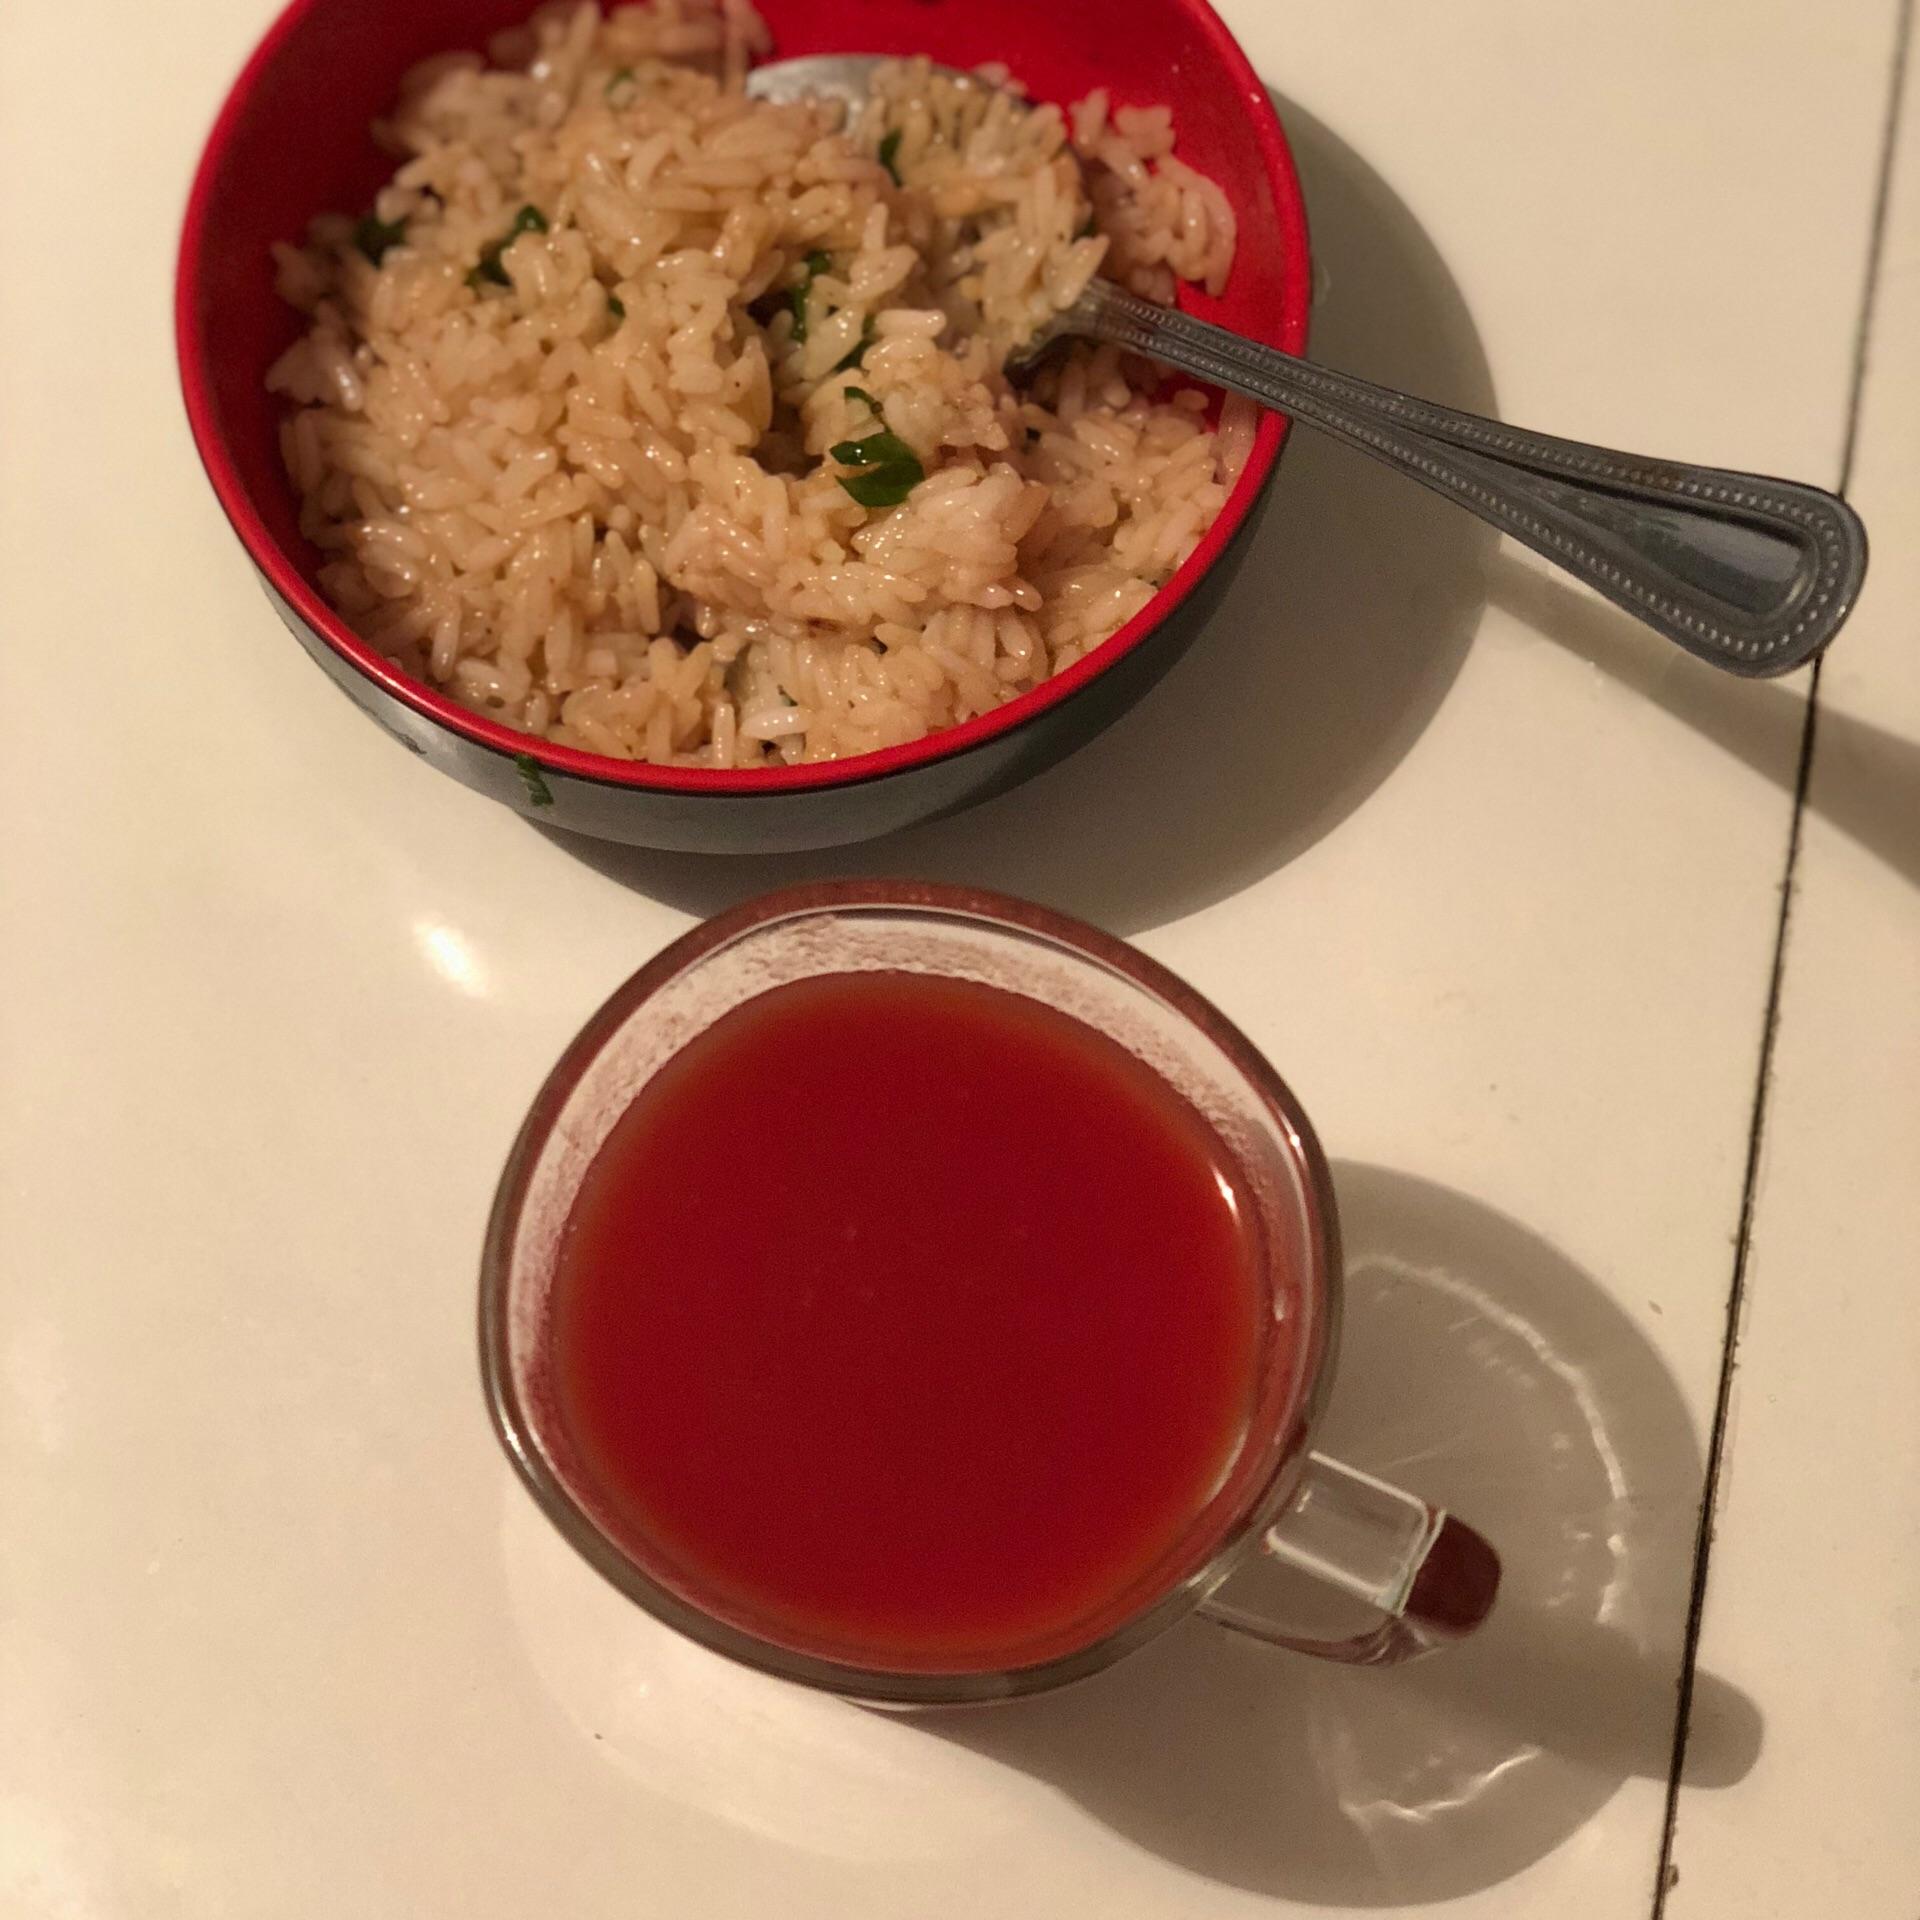 Диета на гречке и томатный сок